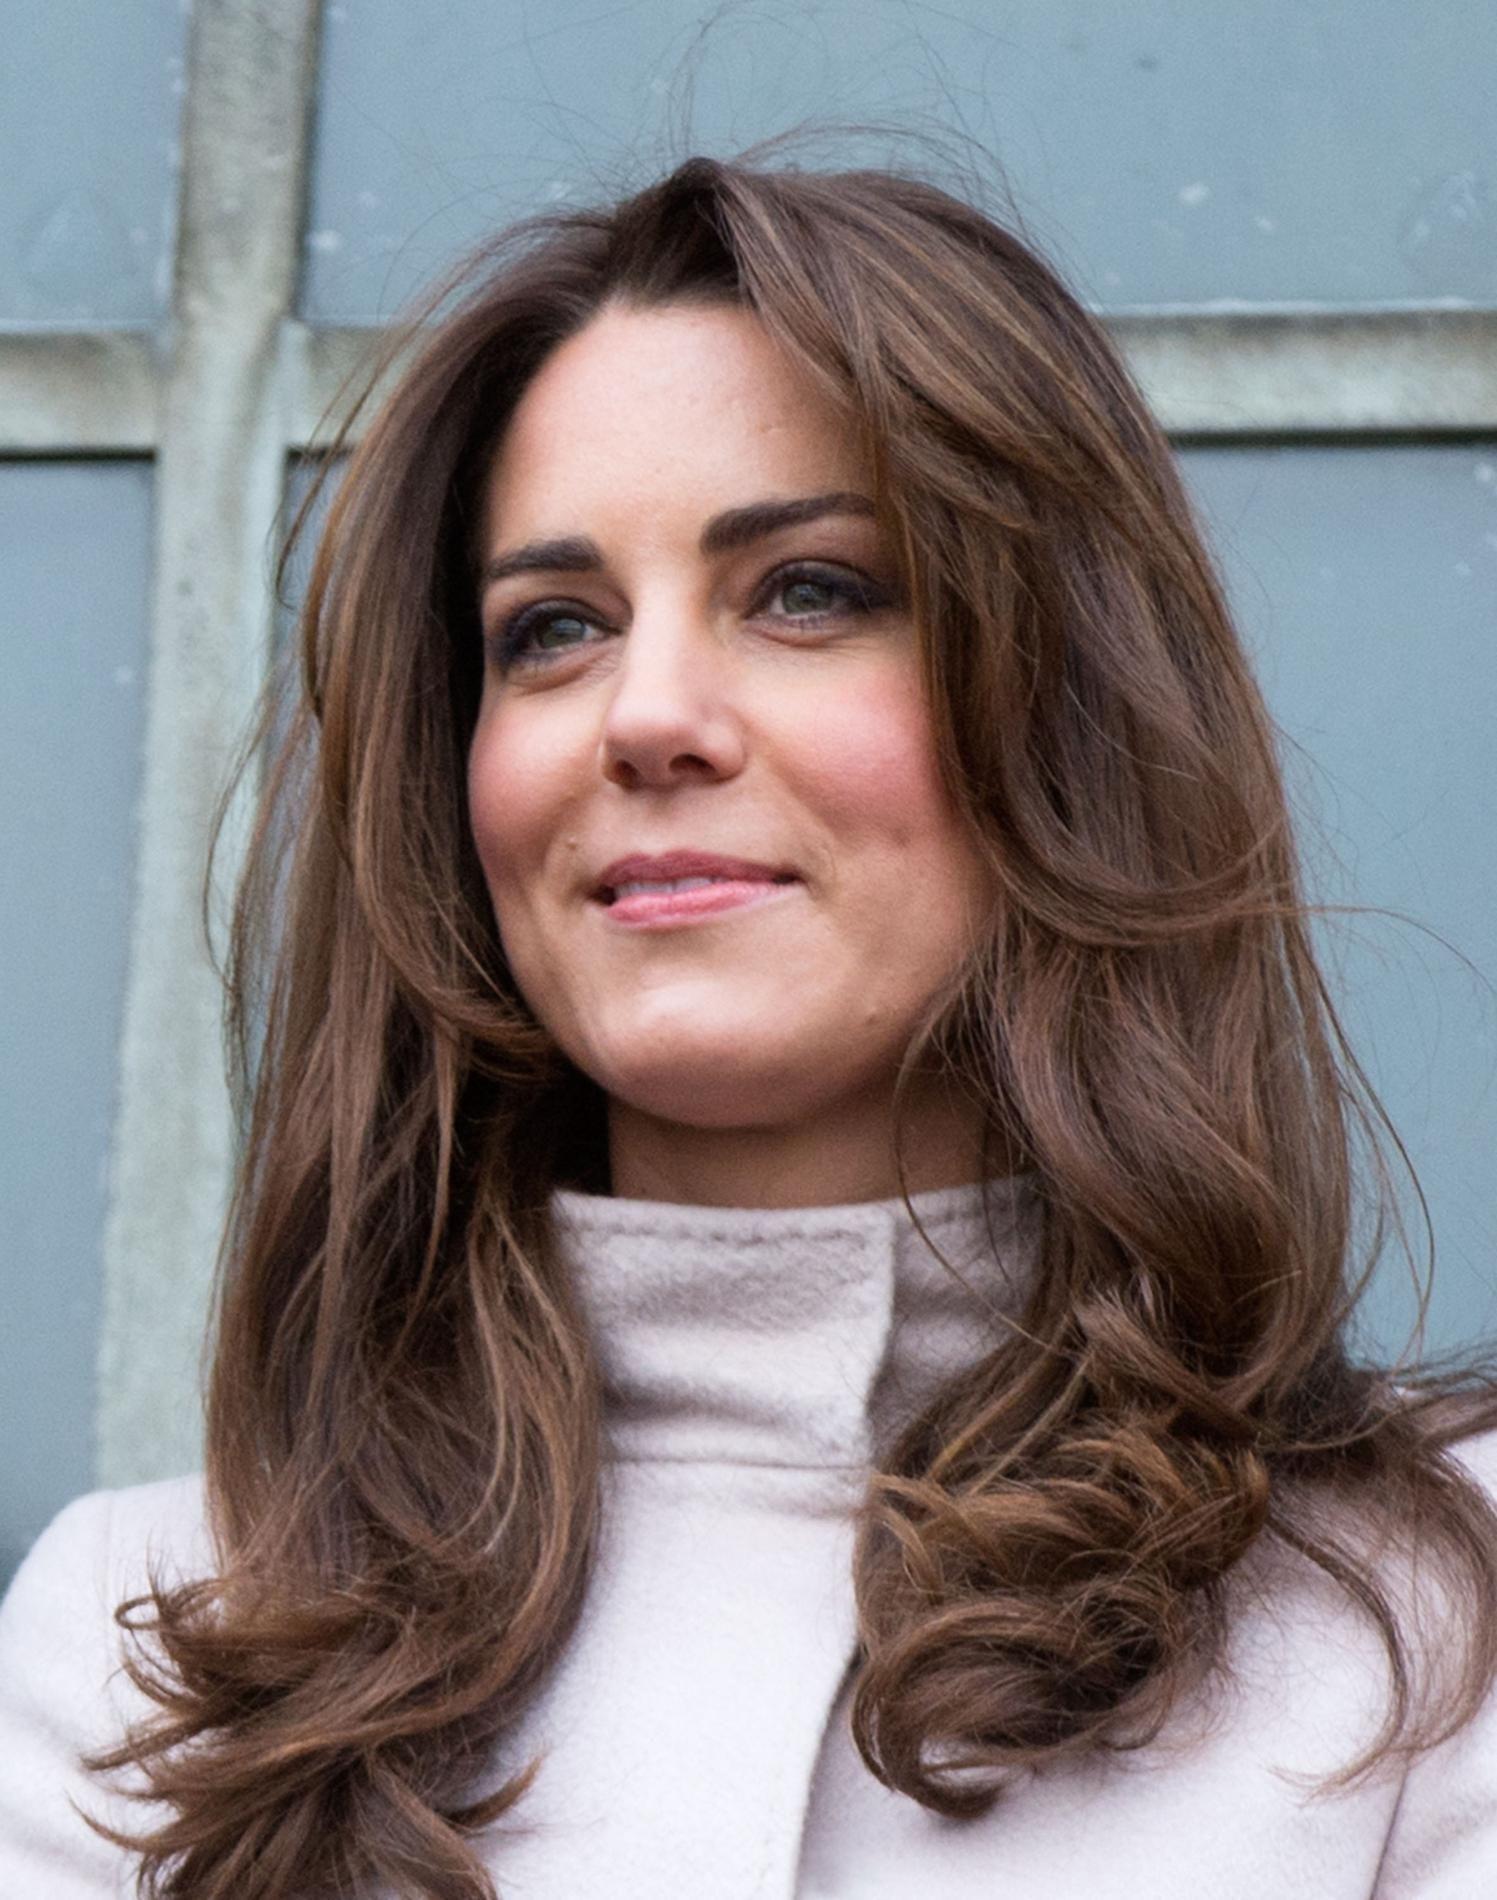 Kate Middleton adopte une nouvelle coiffure pour lu0026#39;u00e9tu00e9 et nu0026#39;a pas hu00e9situ00e9 u00e0 couper | Nouvelles ...